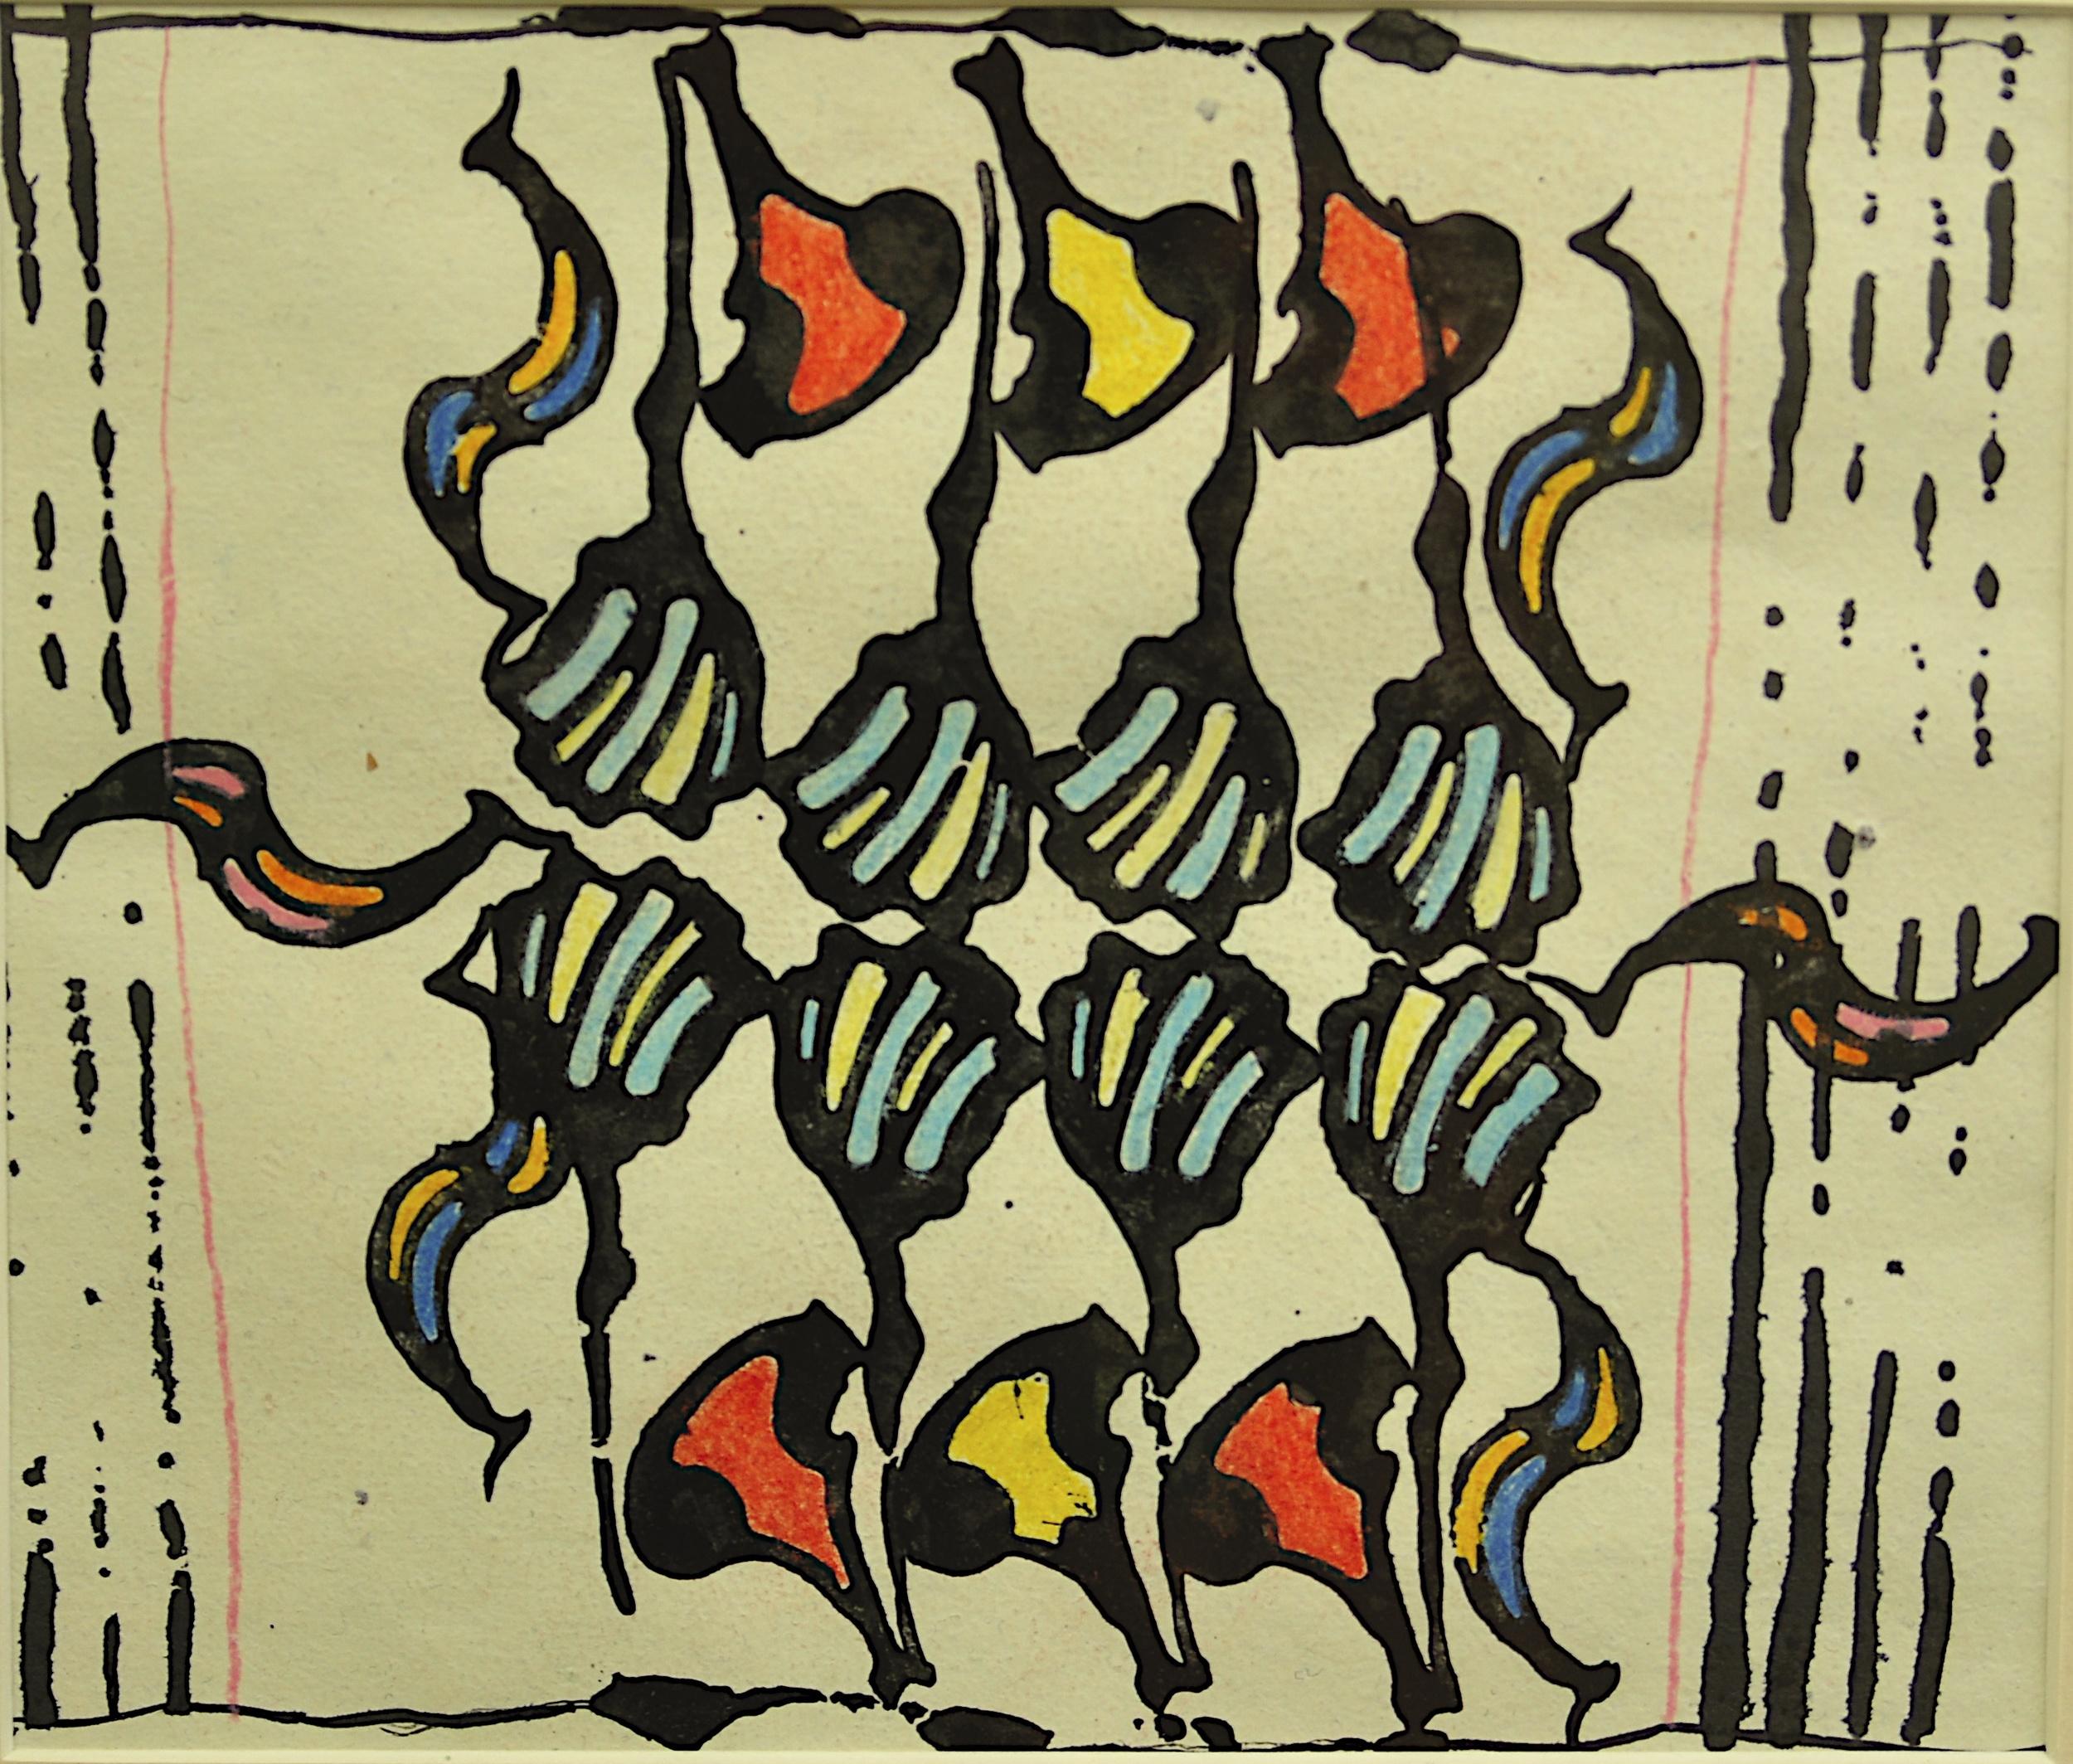 "'at Shivala Ghat', handmade paper (Jaipur), block print, colored pencil, 8"" x 8"", 2013"